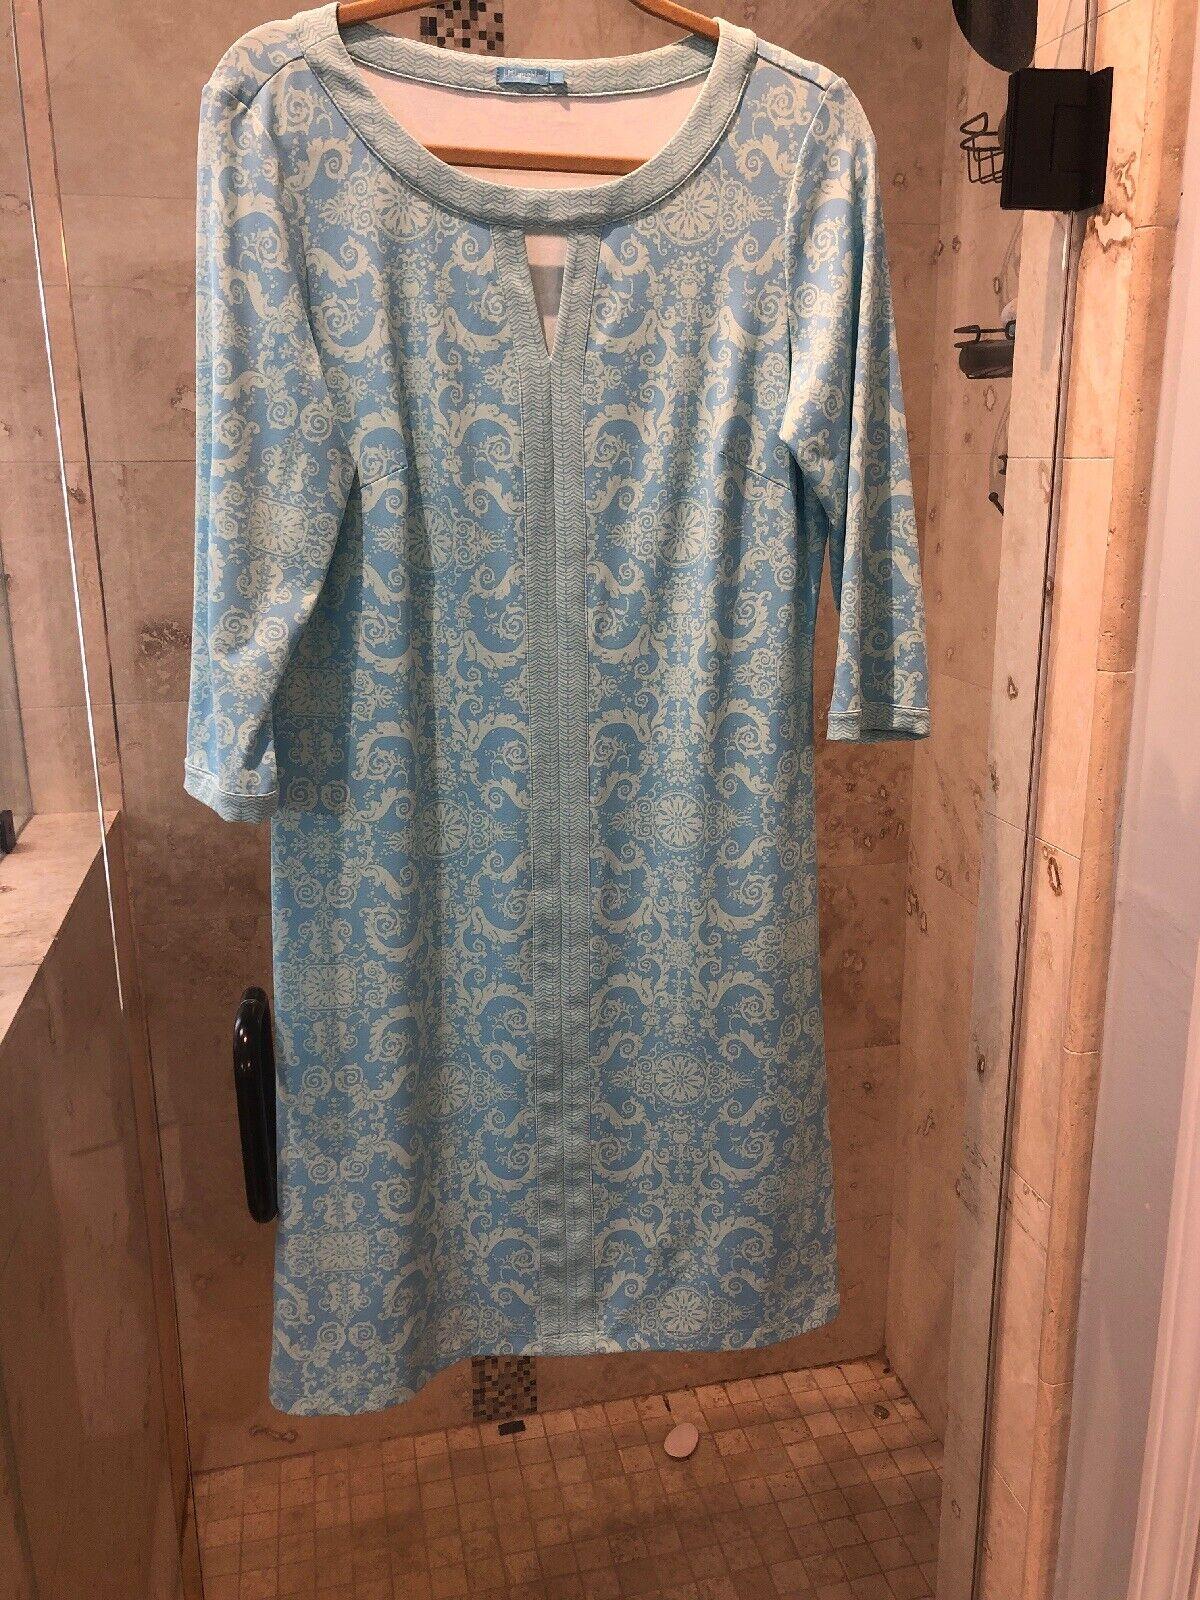 Blau Grün abstract print J. MCLAUGHLIN stretch 3 4 sleeve shift dress L Summer